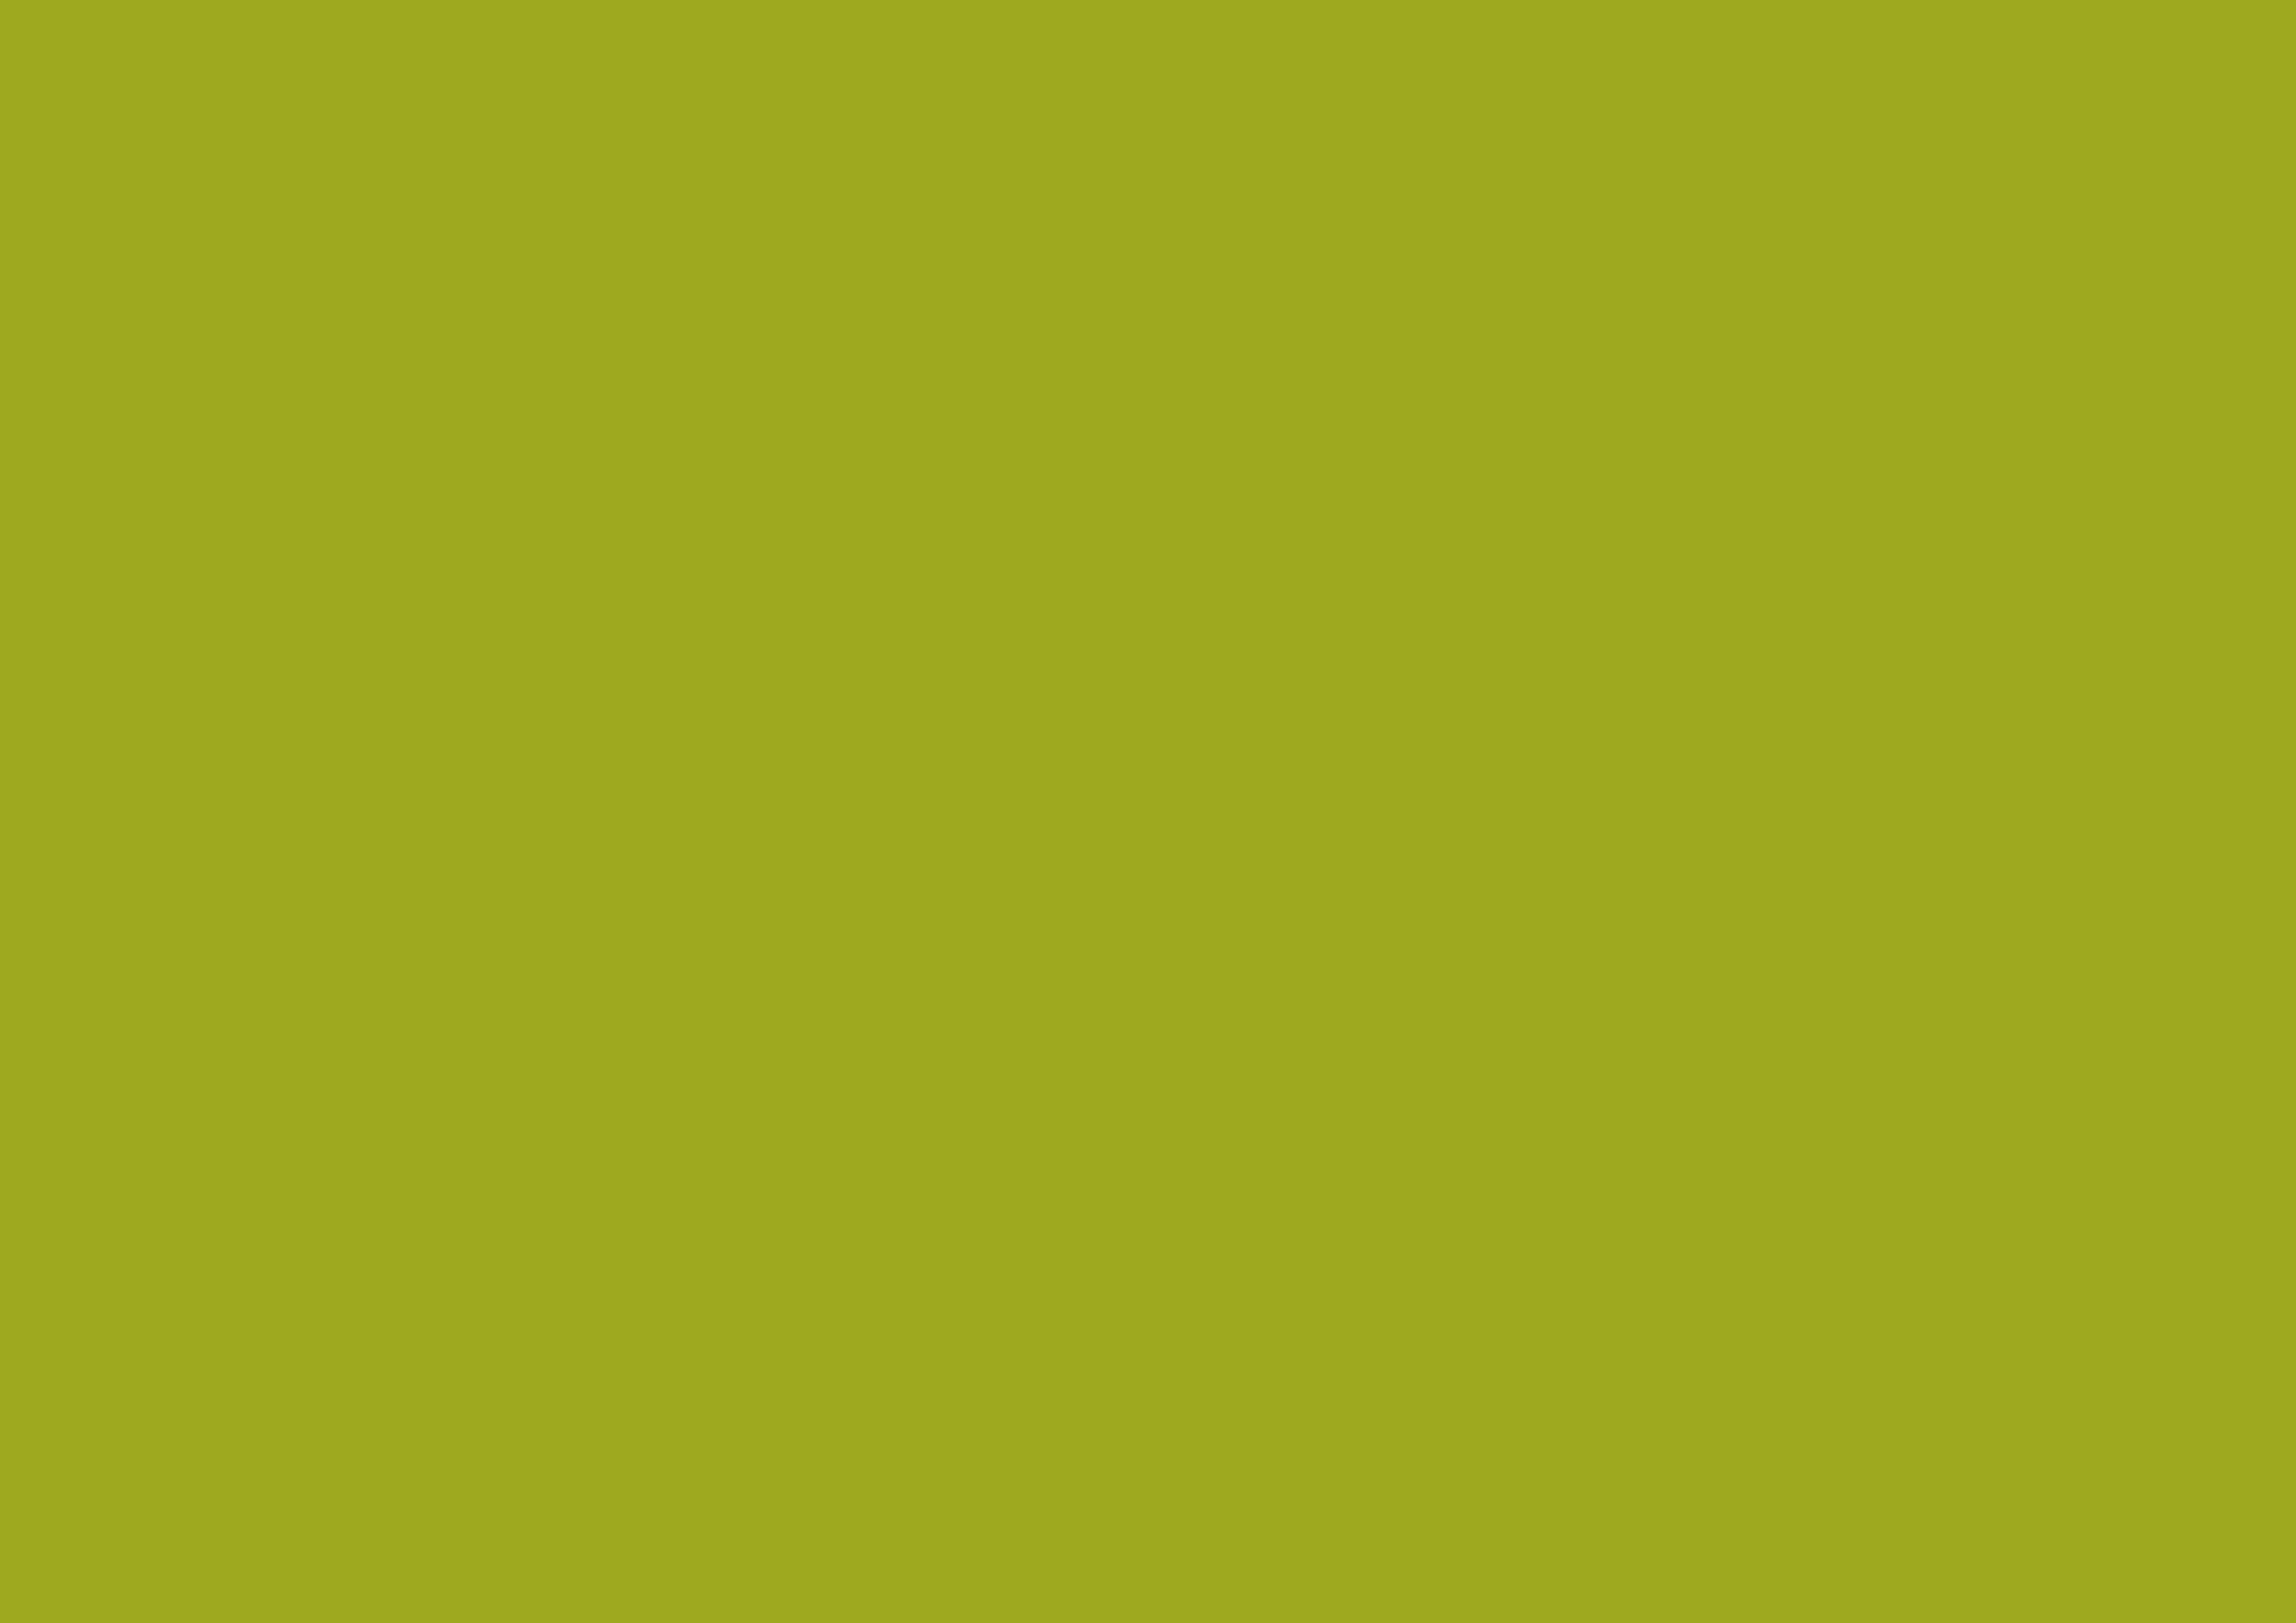 3508x2480 Citron Solid Color Background